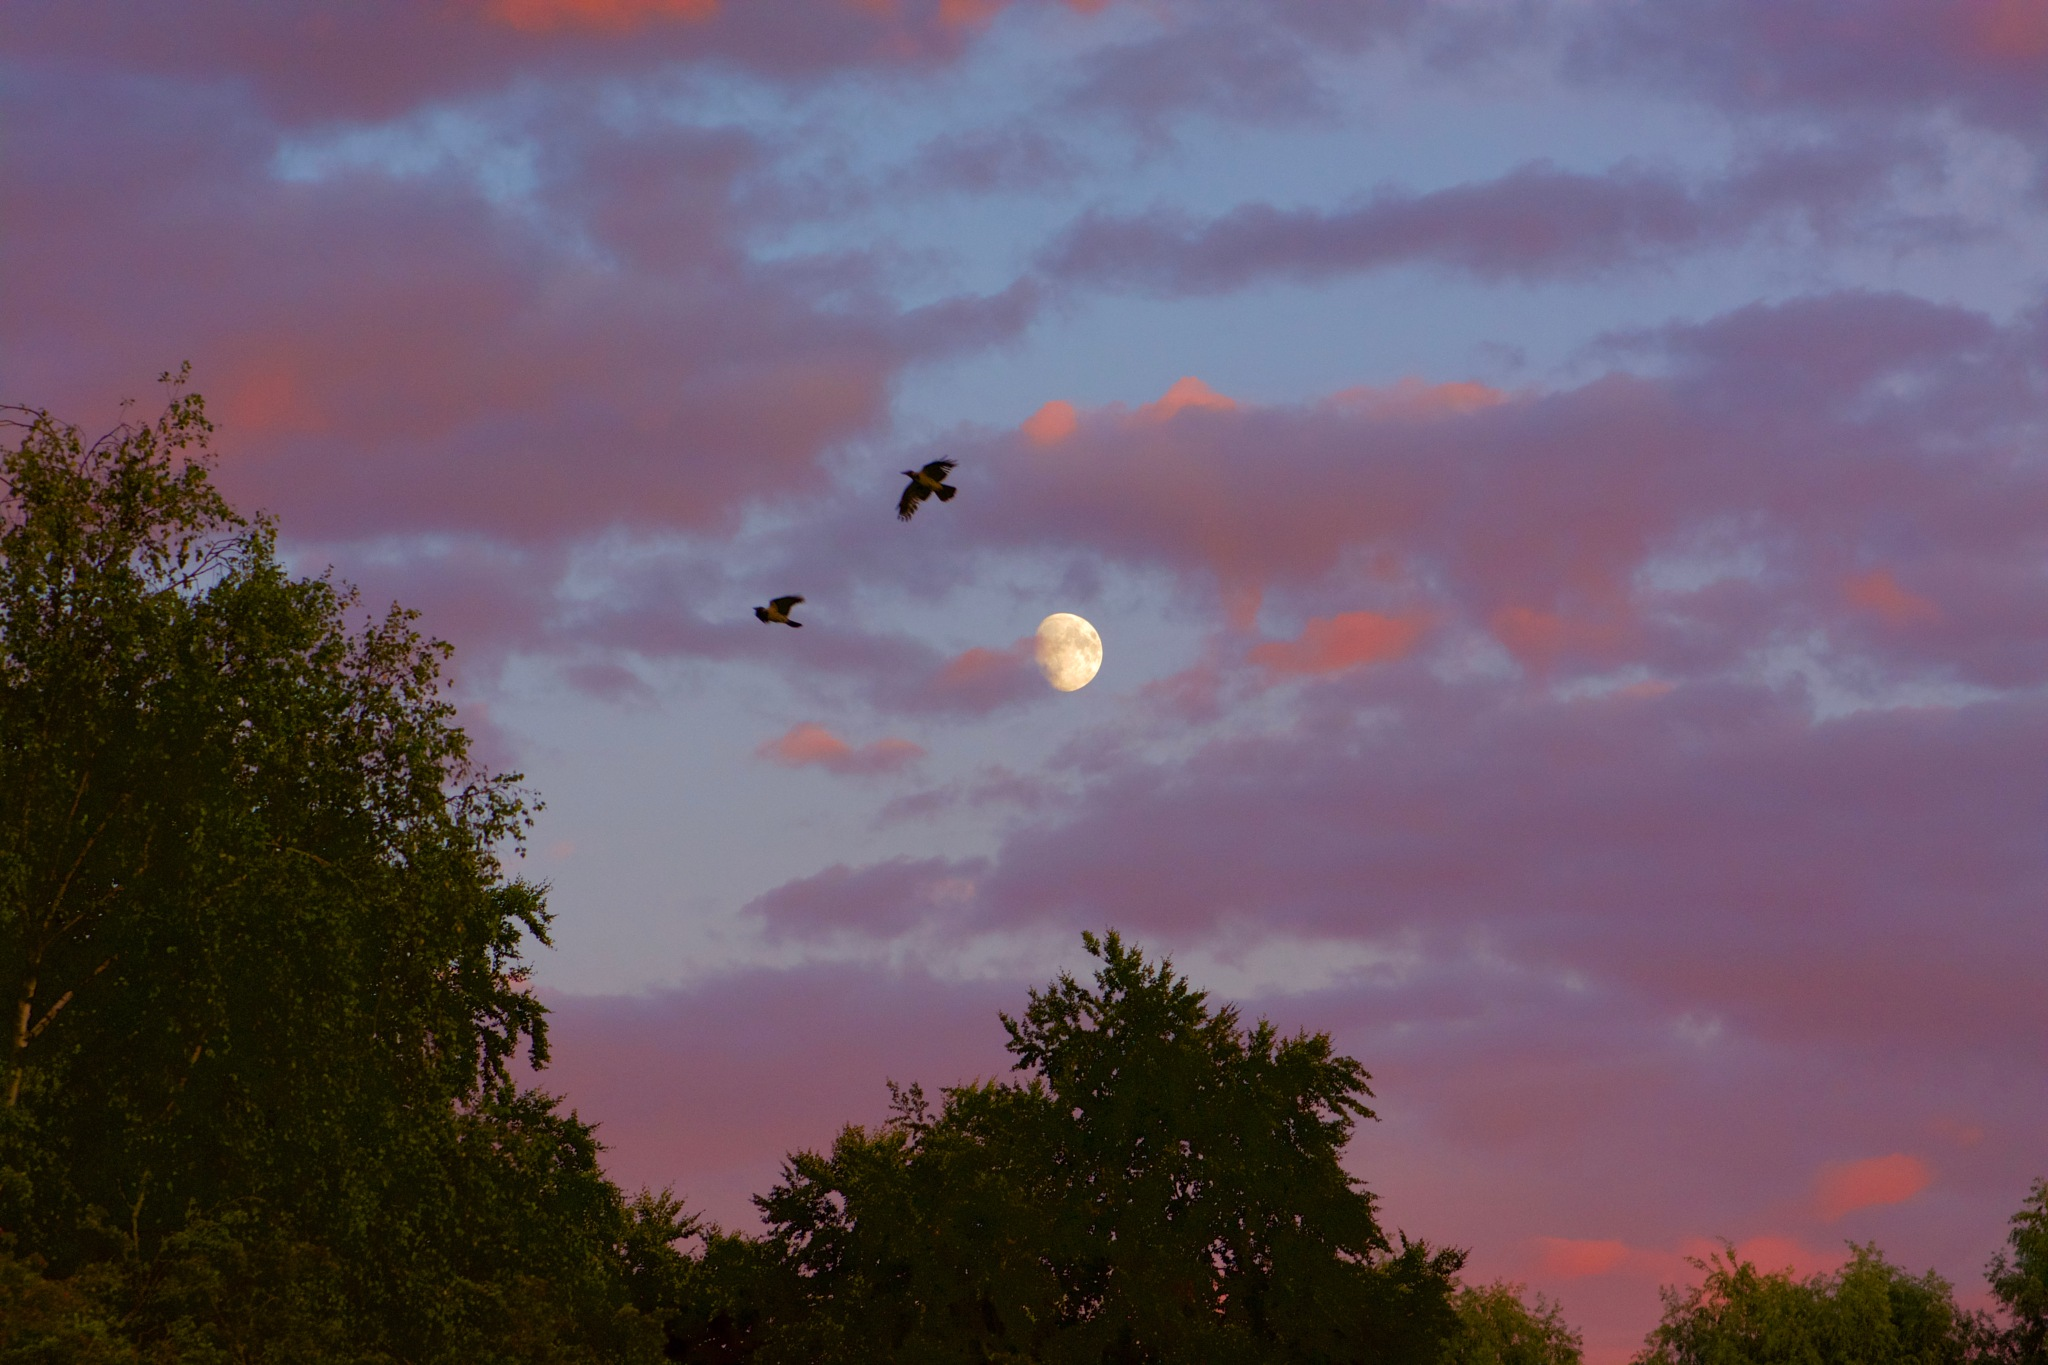 Moon & Bird 54! by Memed Bayatli